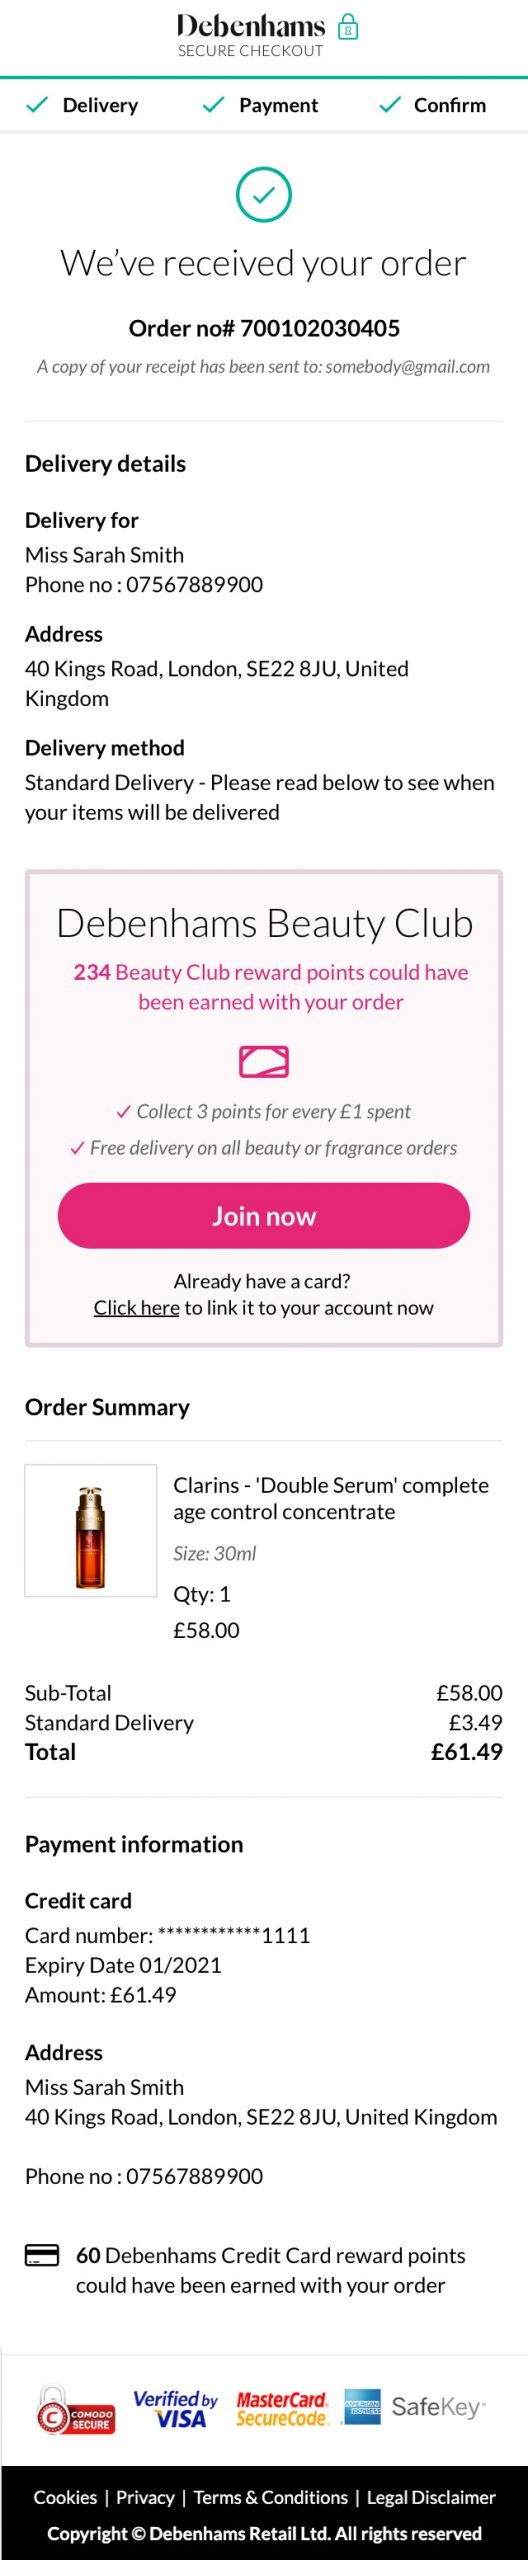 Order_Confirmation_mobile